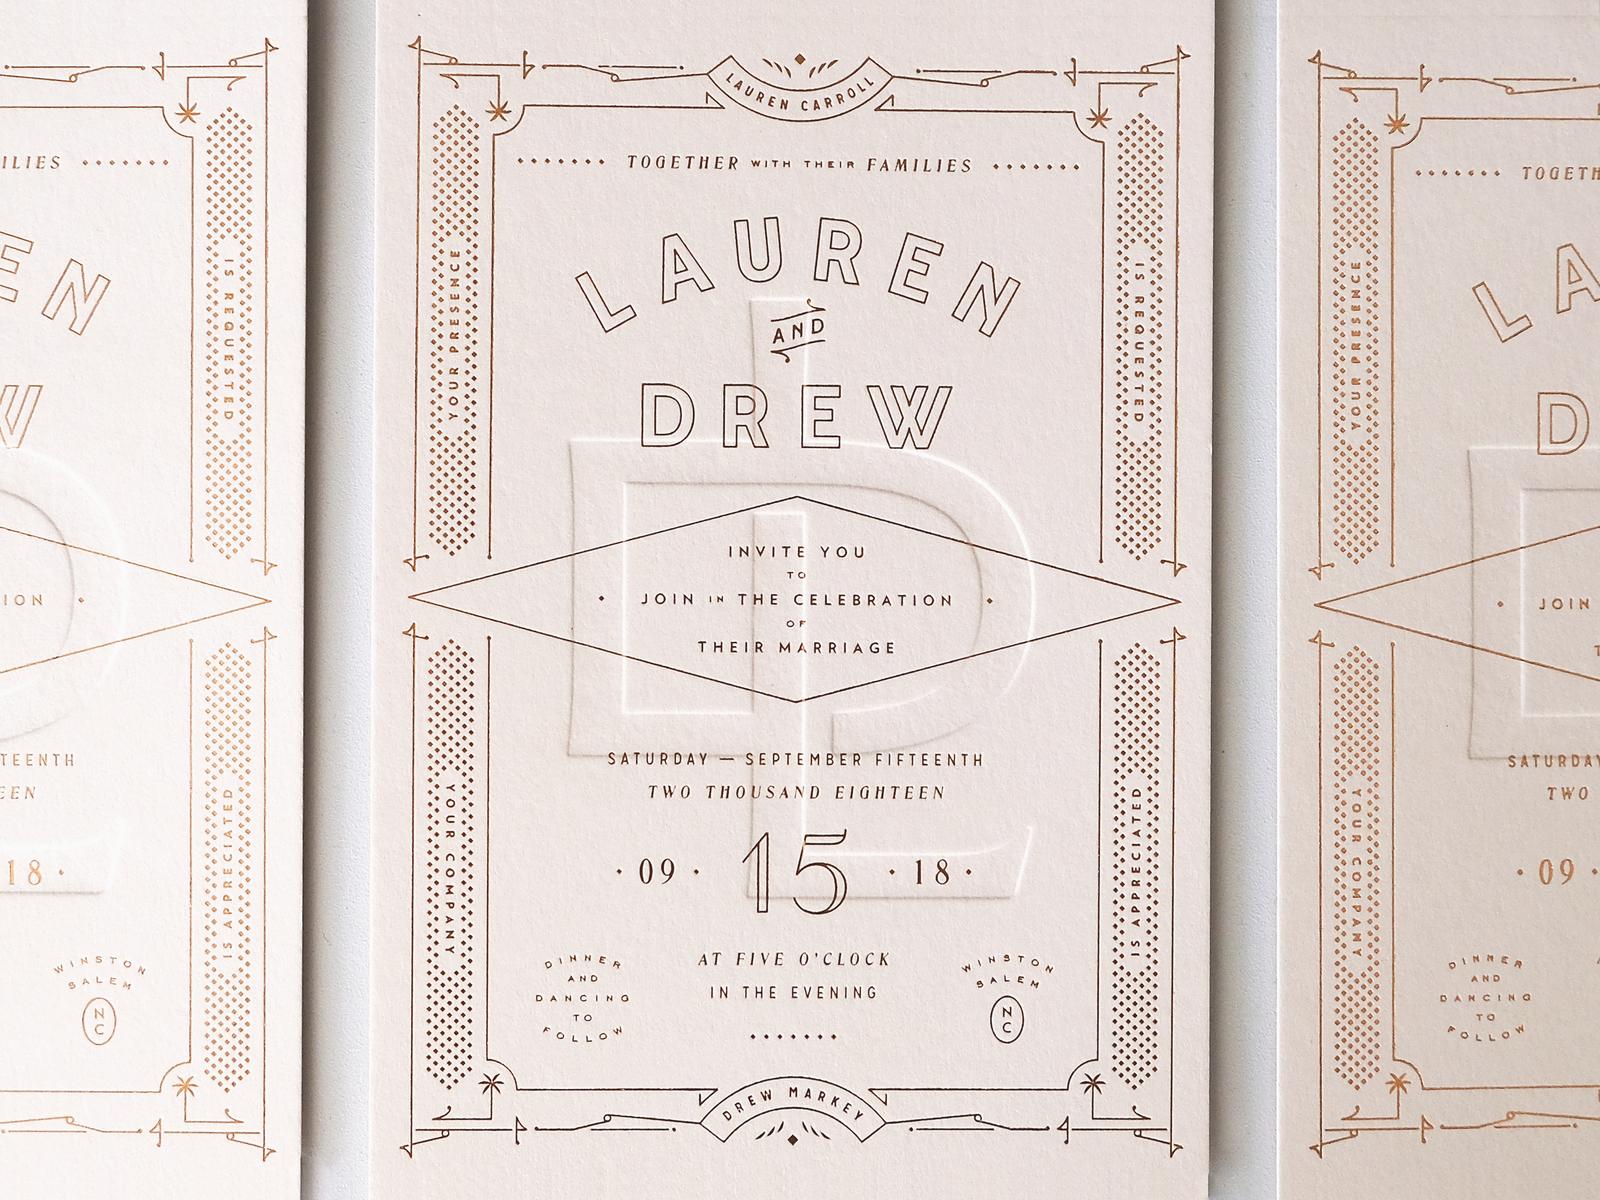 Wedding invitation design deboss foil overprint art deco card invitation wedding layout letterpress emboss french paper pink copper typography